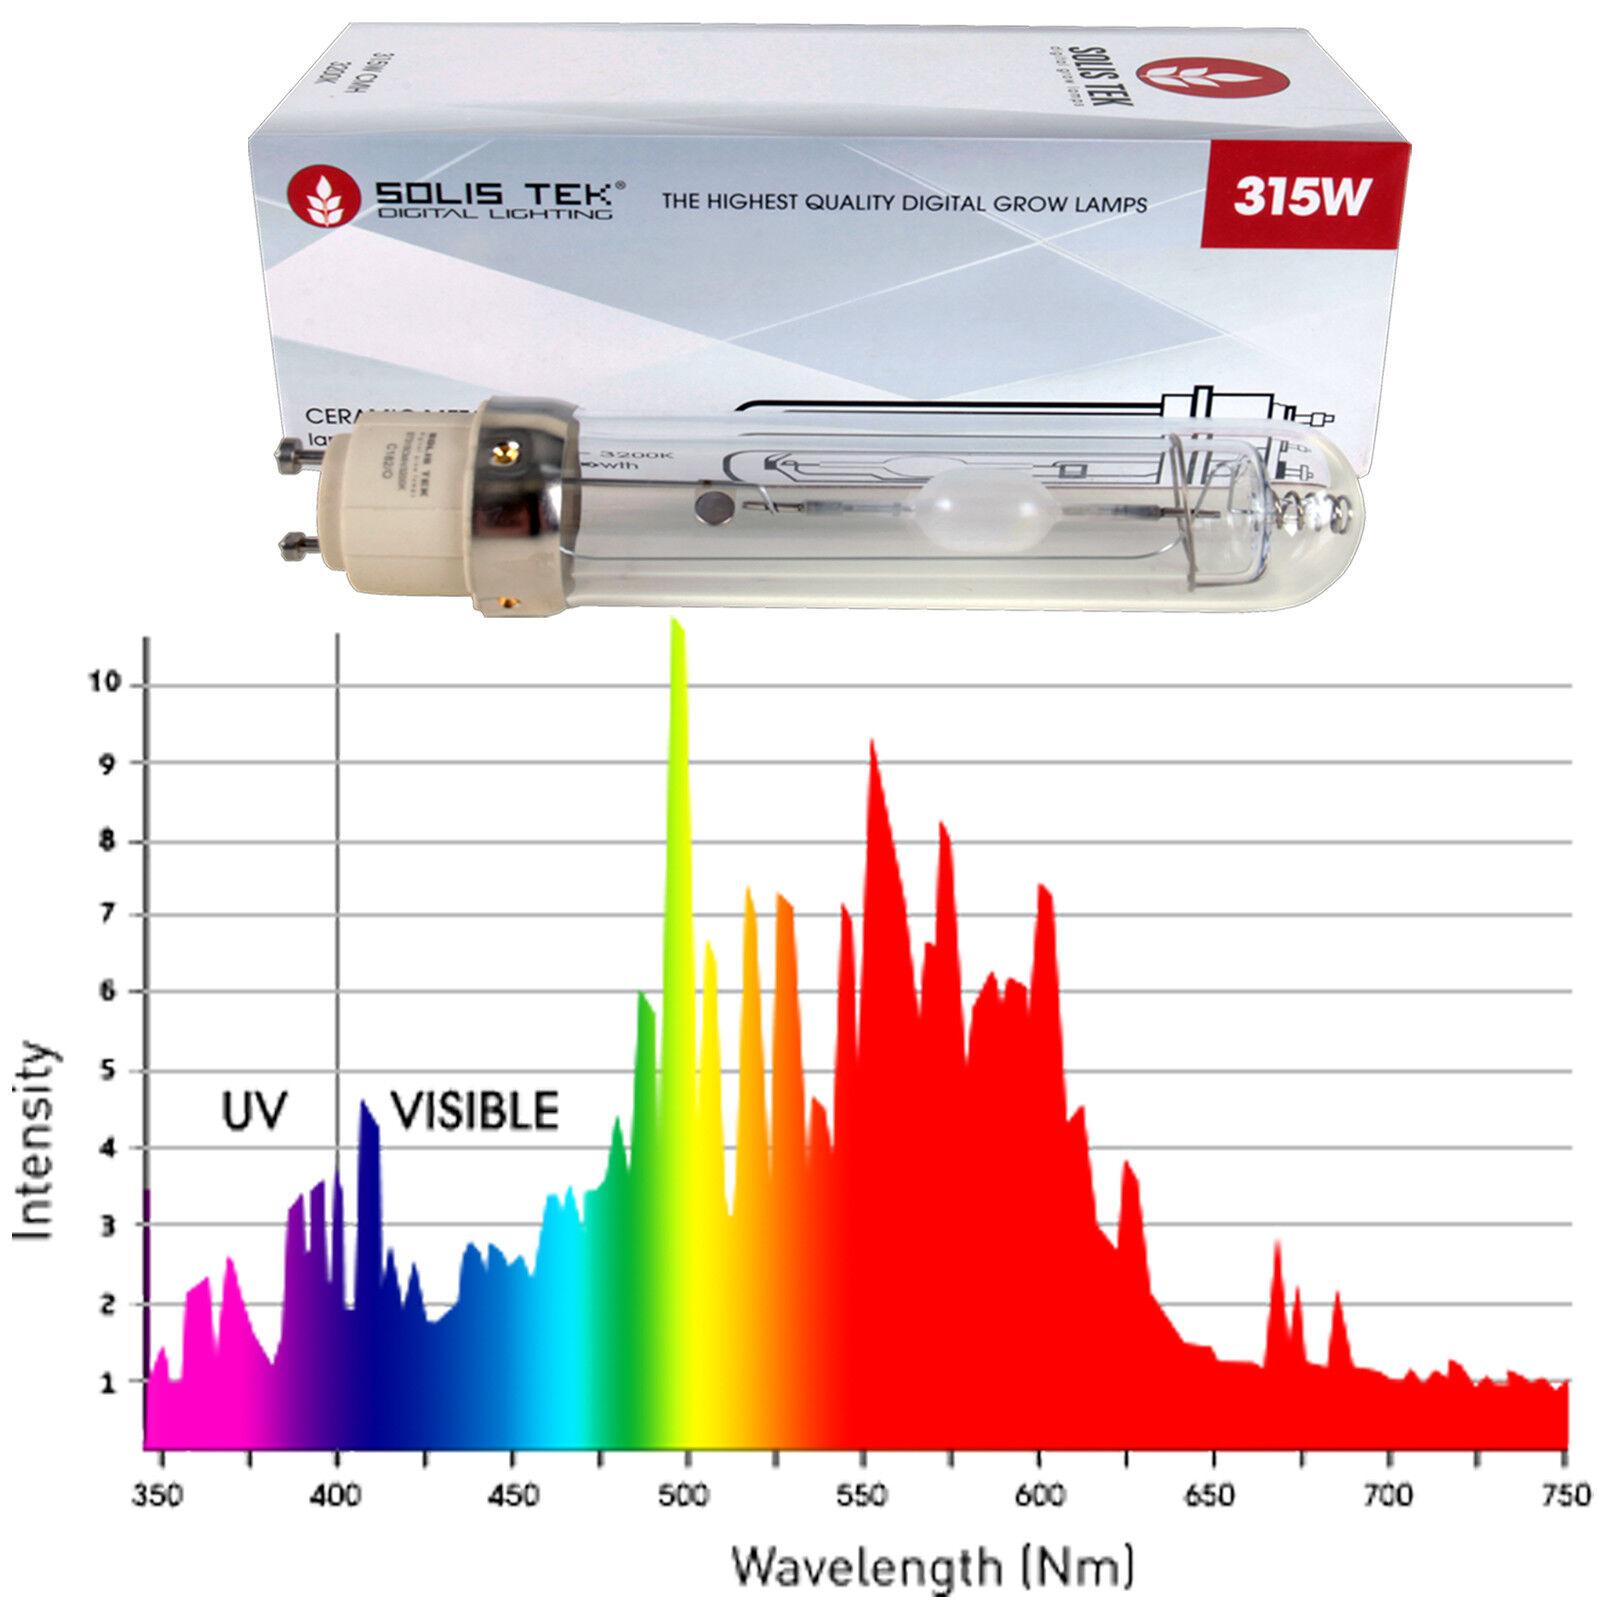 Solistek 315 W Cerámica Metal Halide 3200K Lámpara 1-4 Bombillas CDM hidropónica crecer